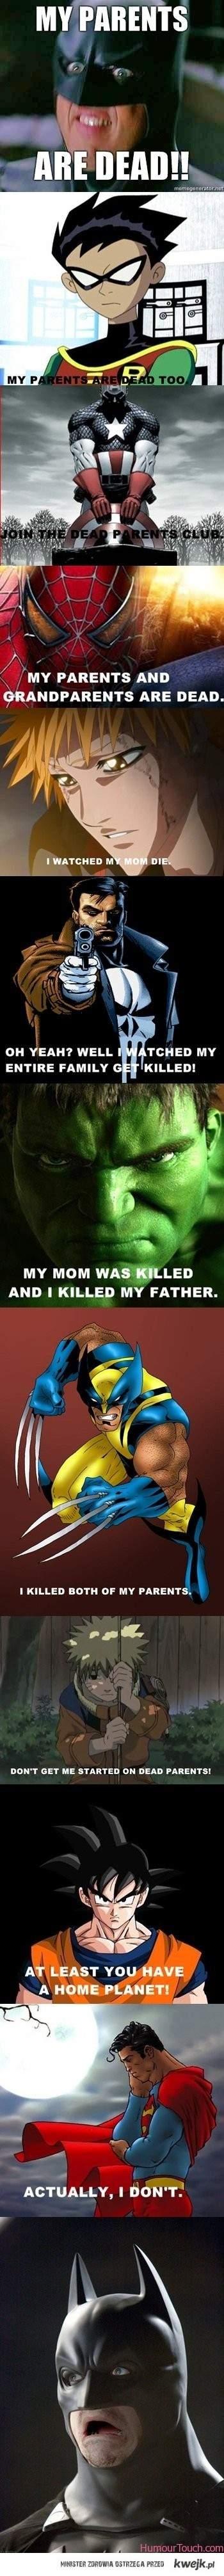 Sad story, Batman.